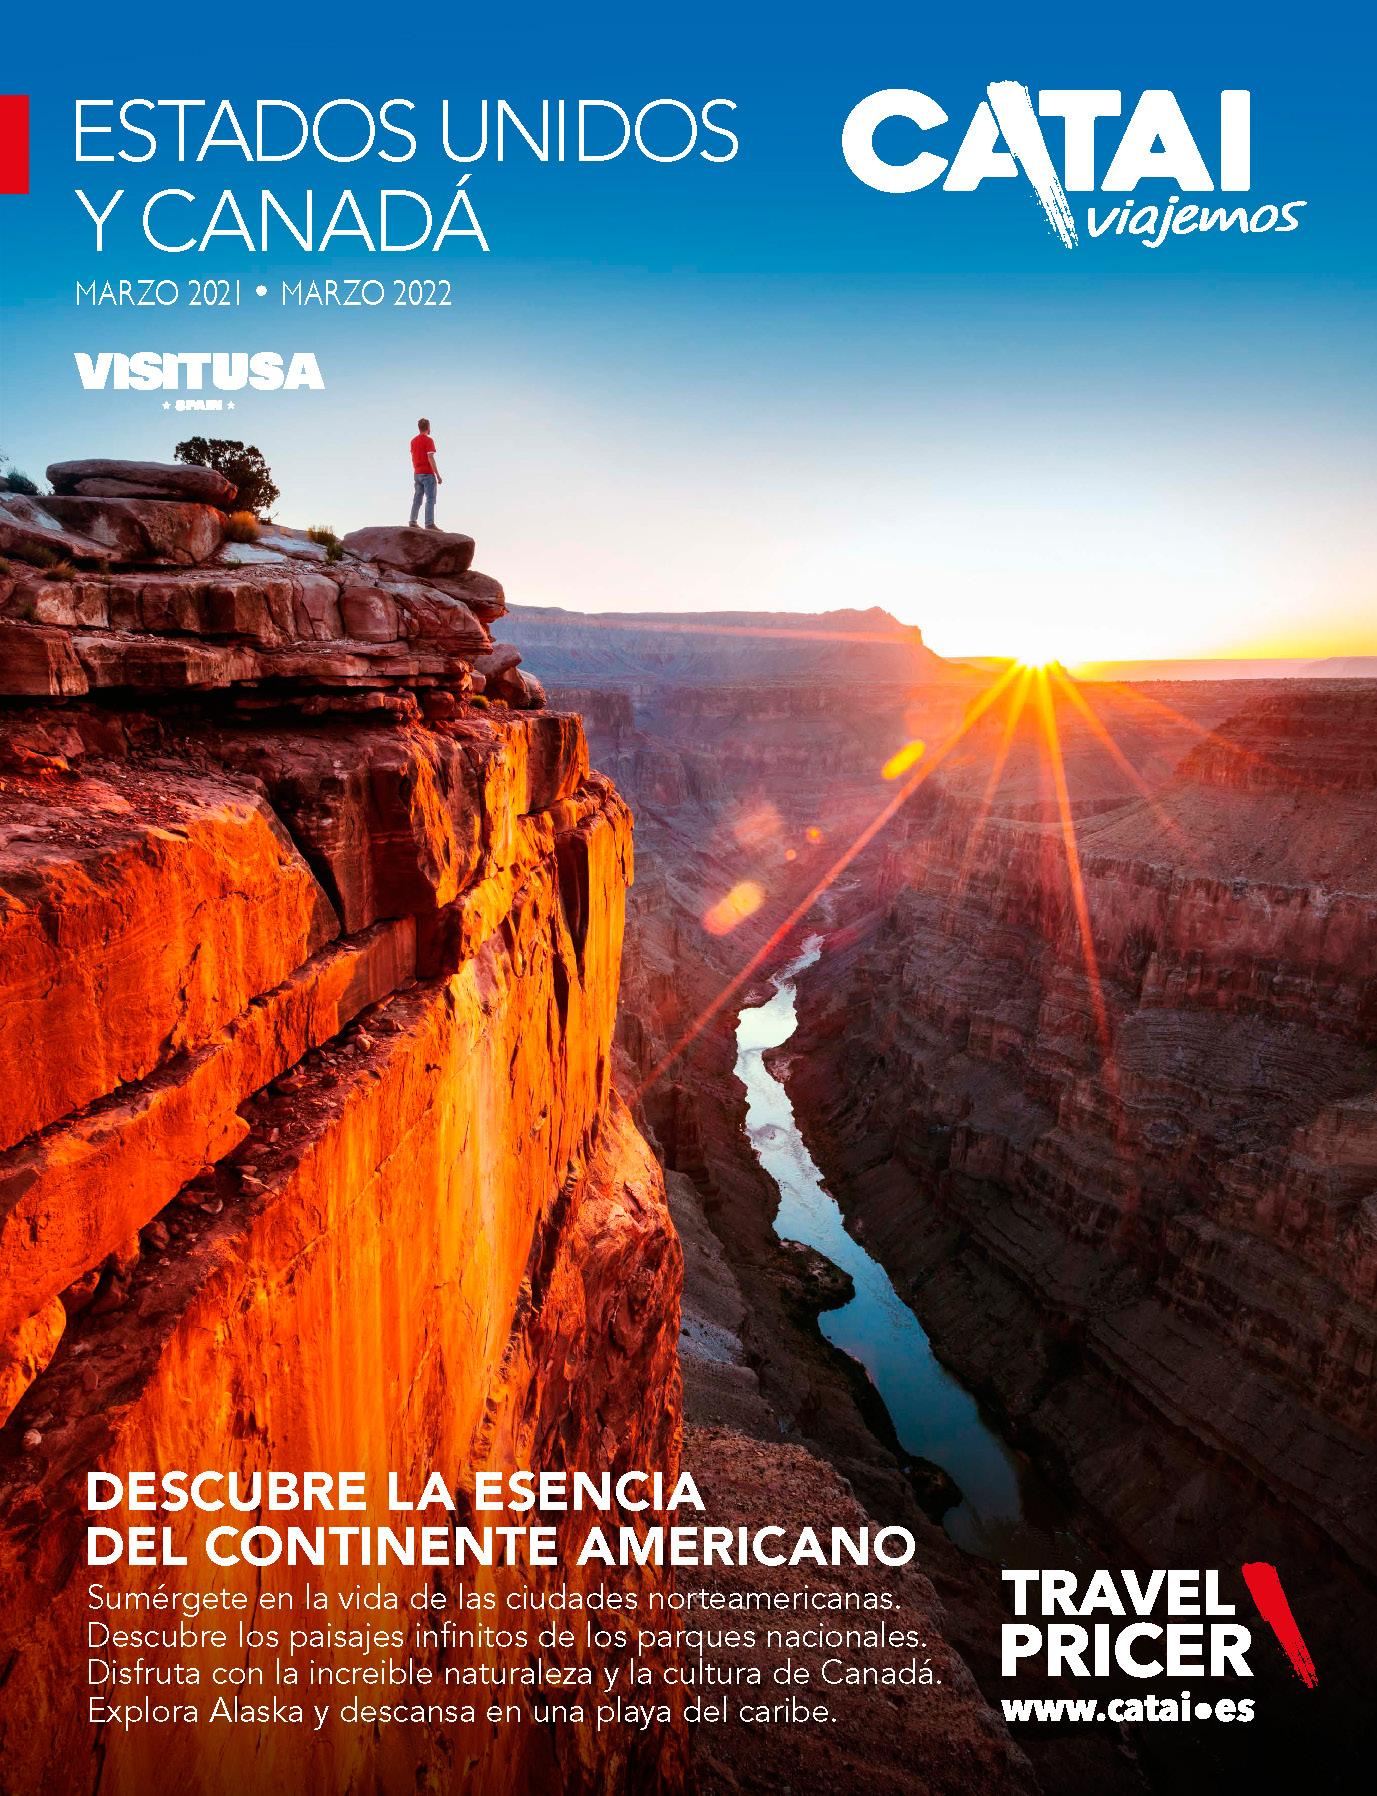 Catalogo Catai USA y Canada 2021-2022